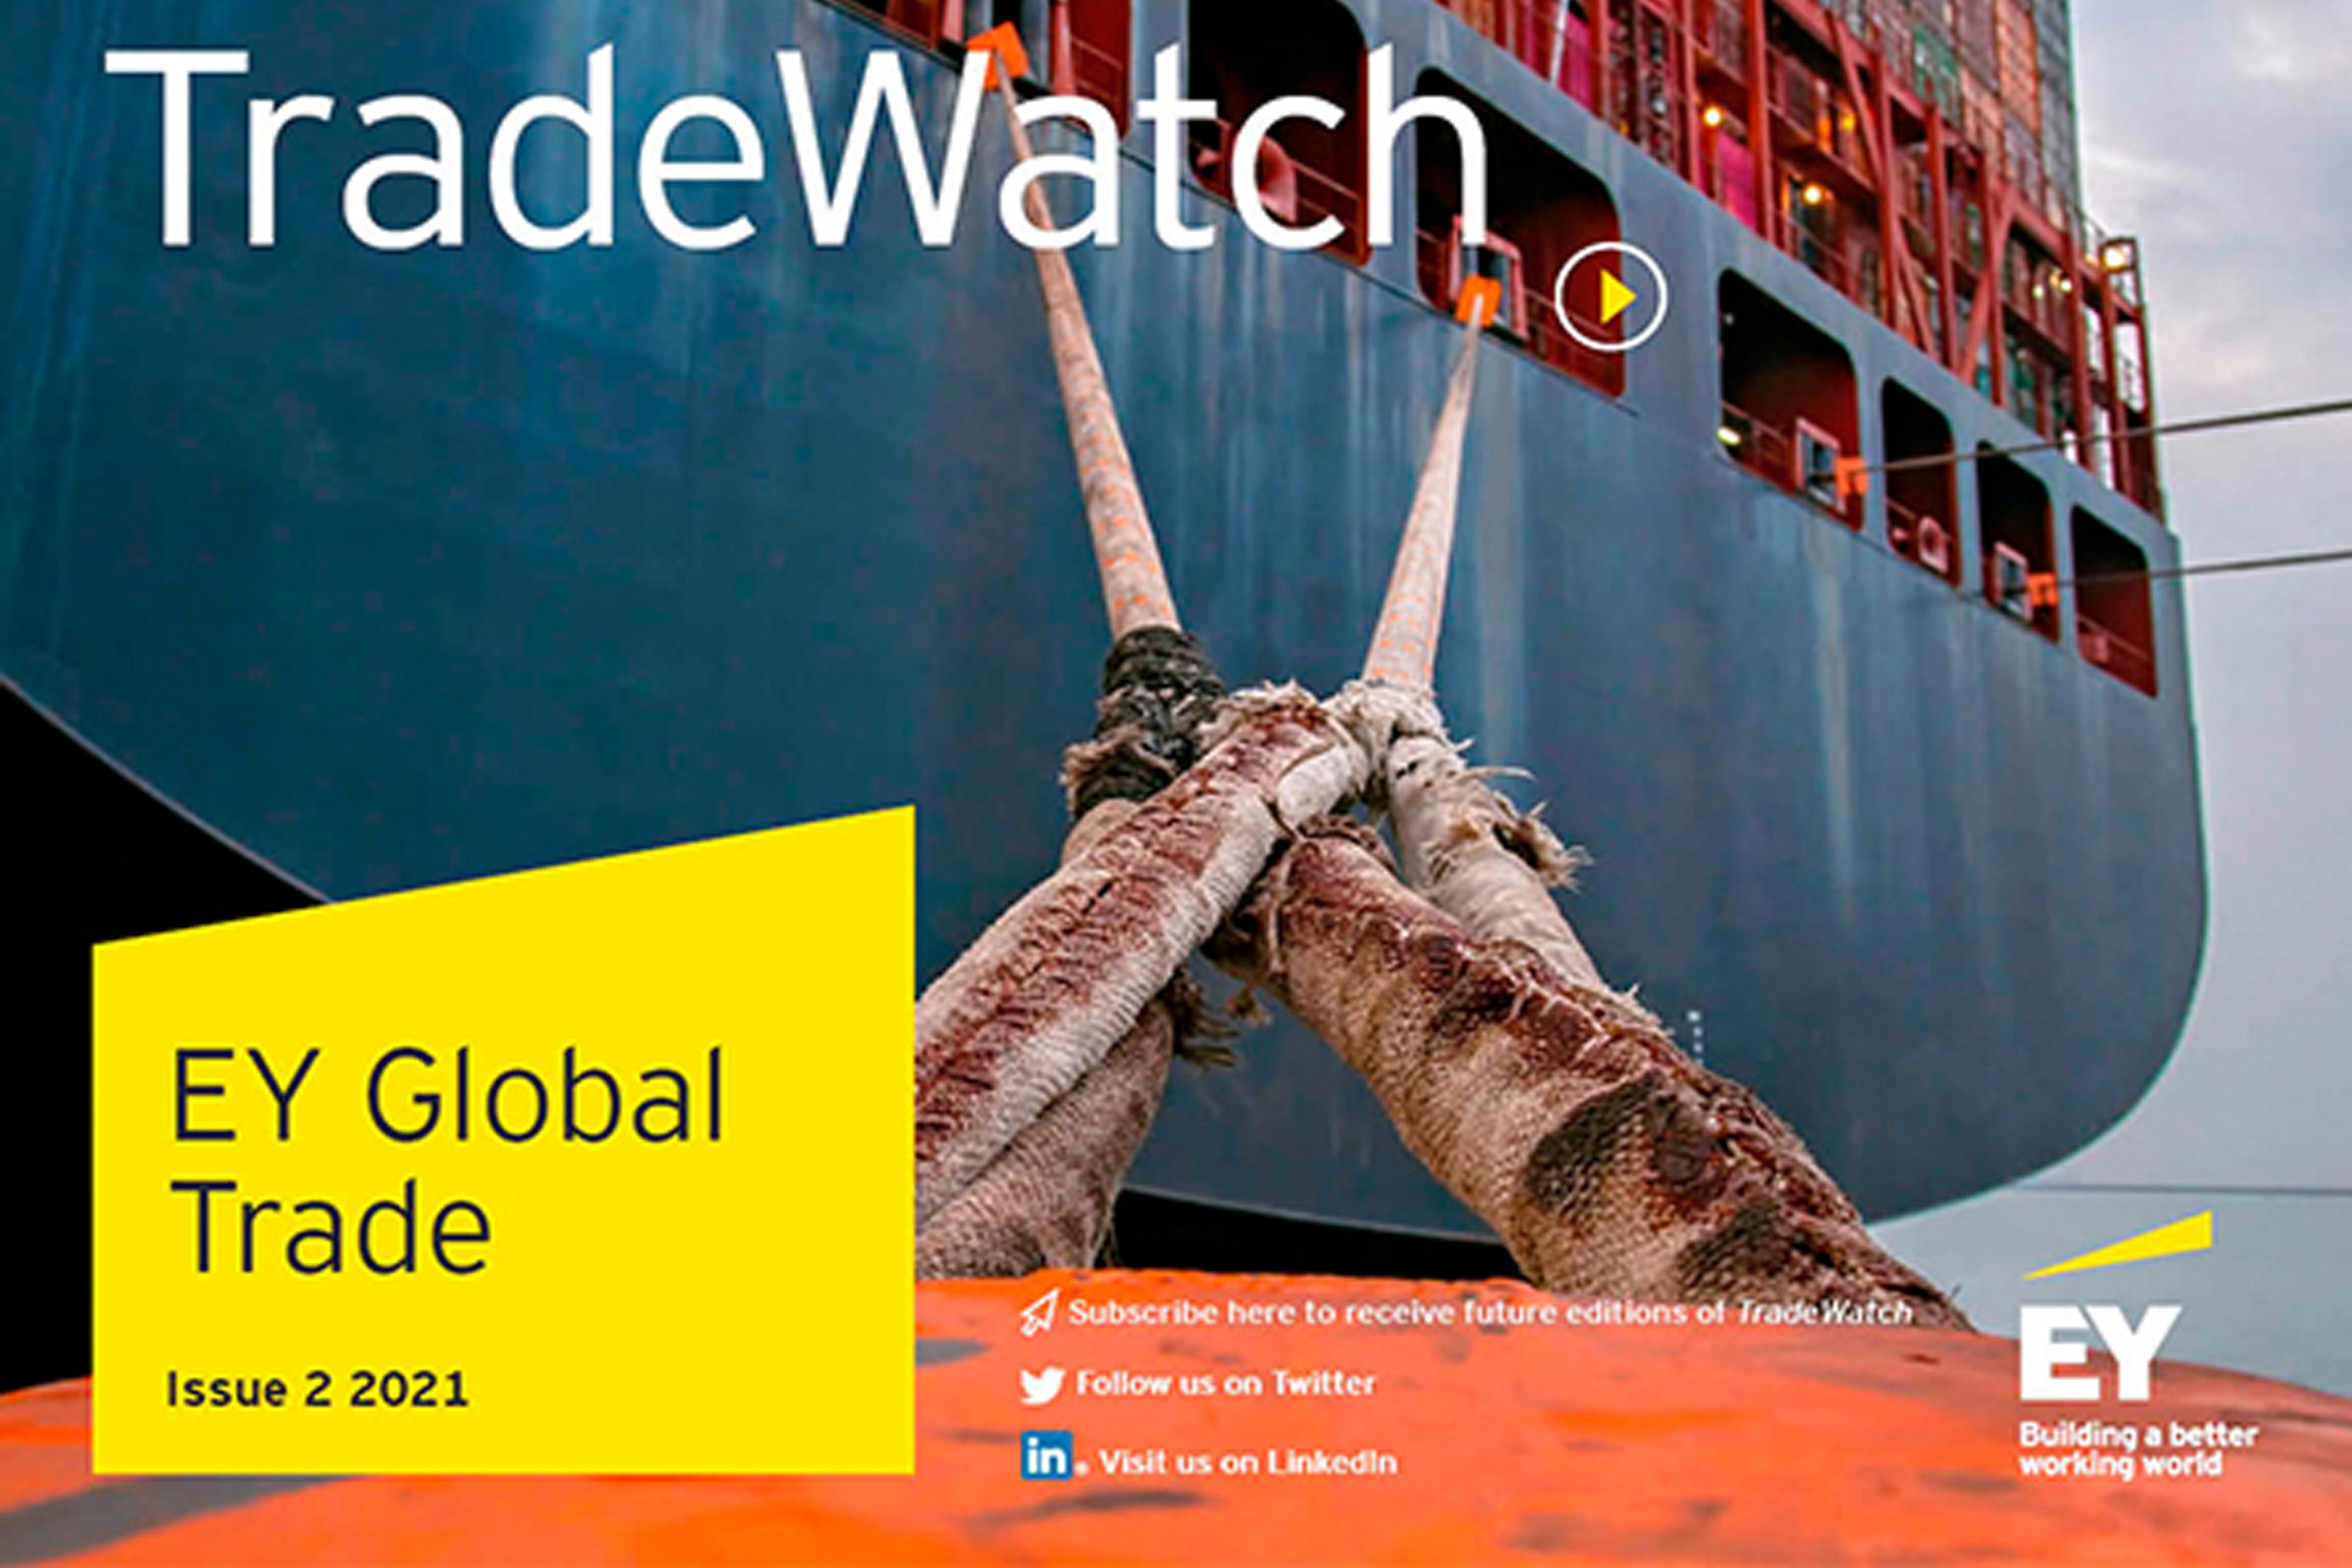 Tradewatch issue image